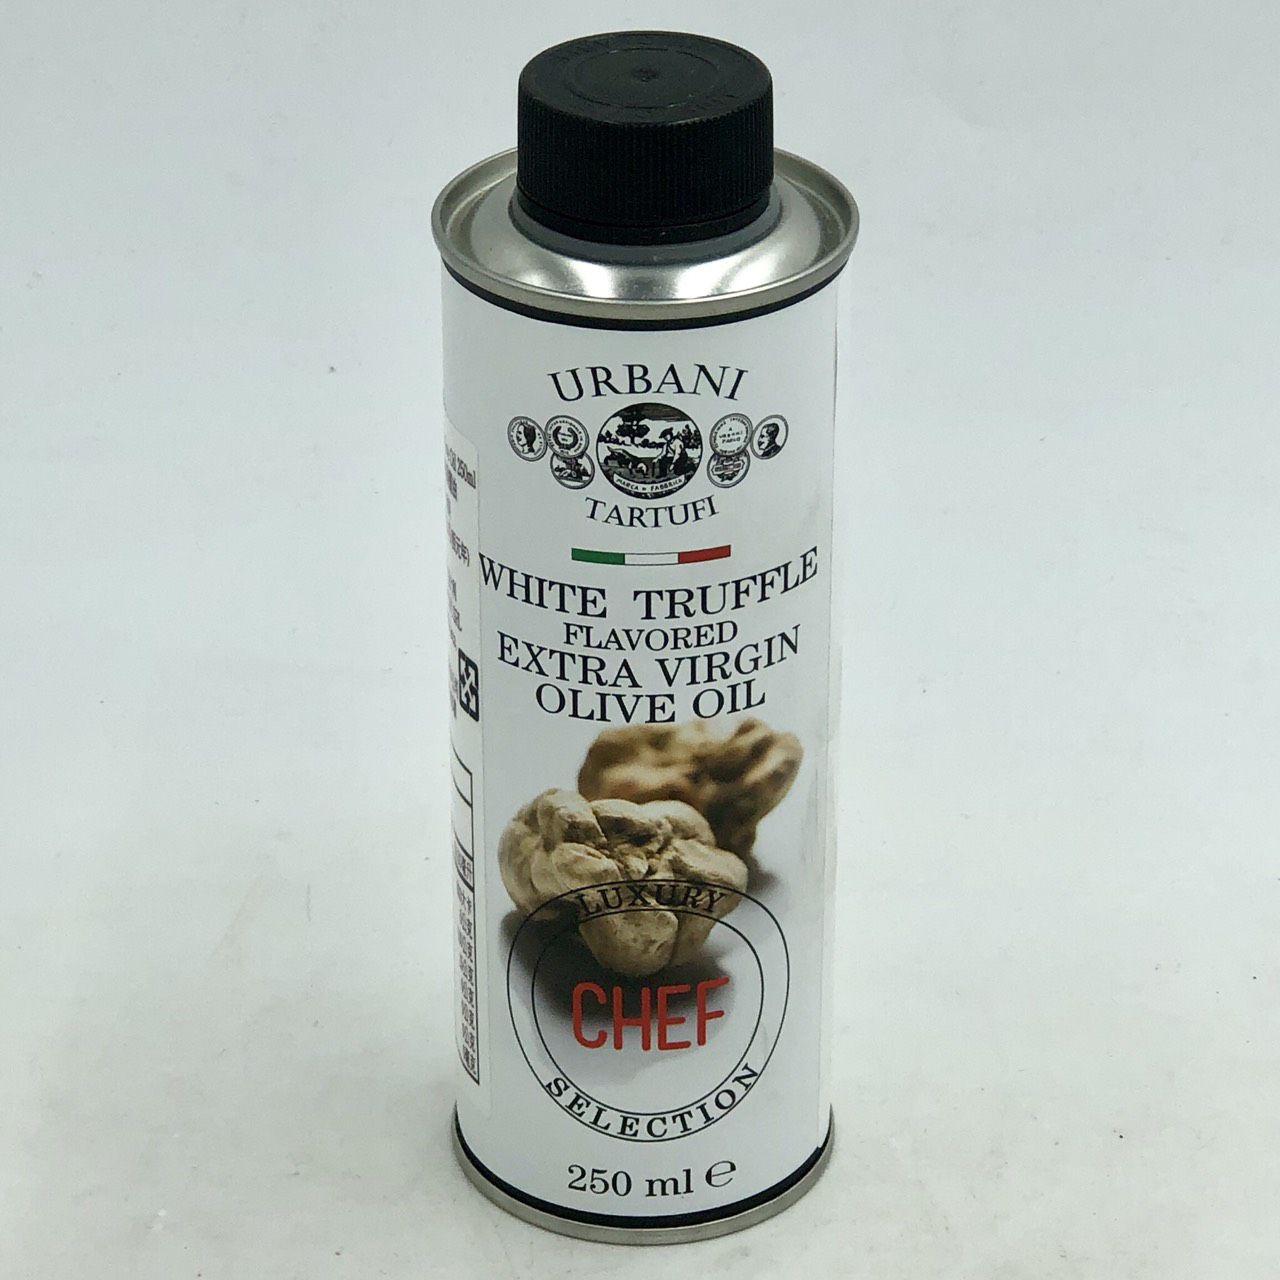 (Urbani)白松露風味橄欖油250ml(全素)